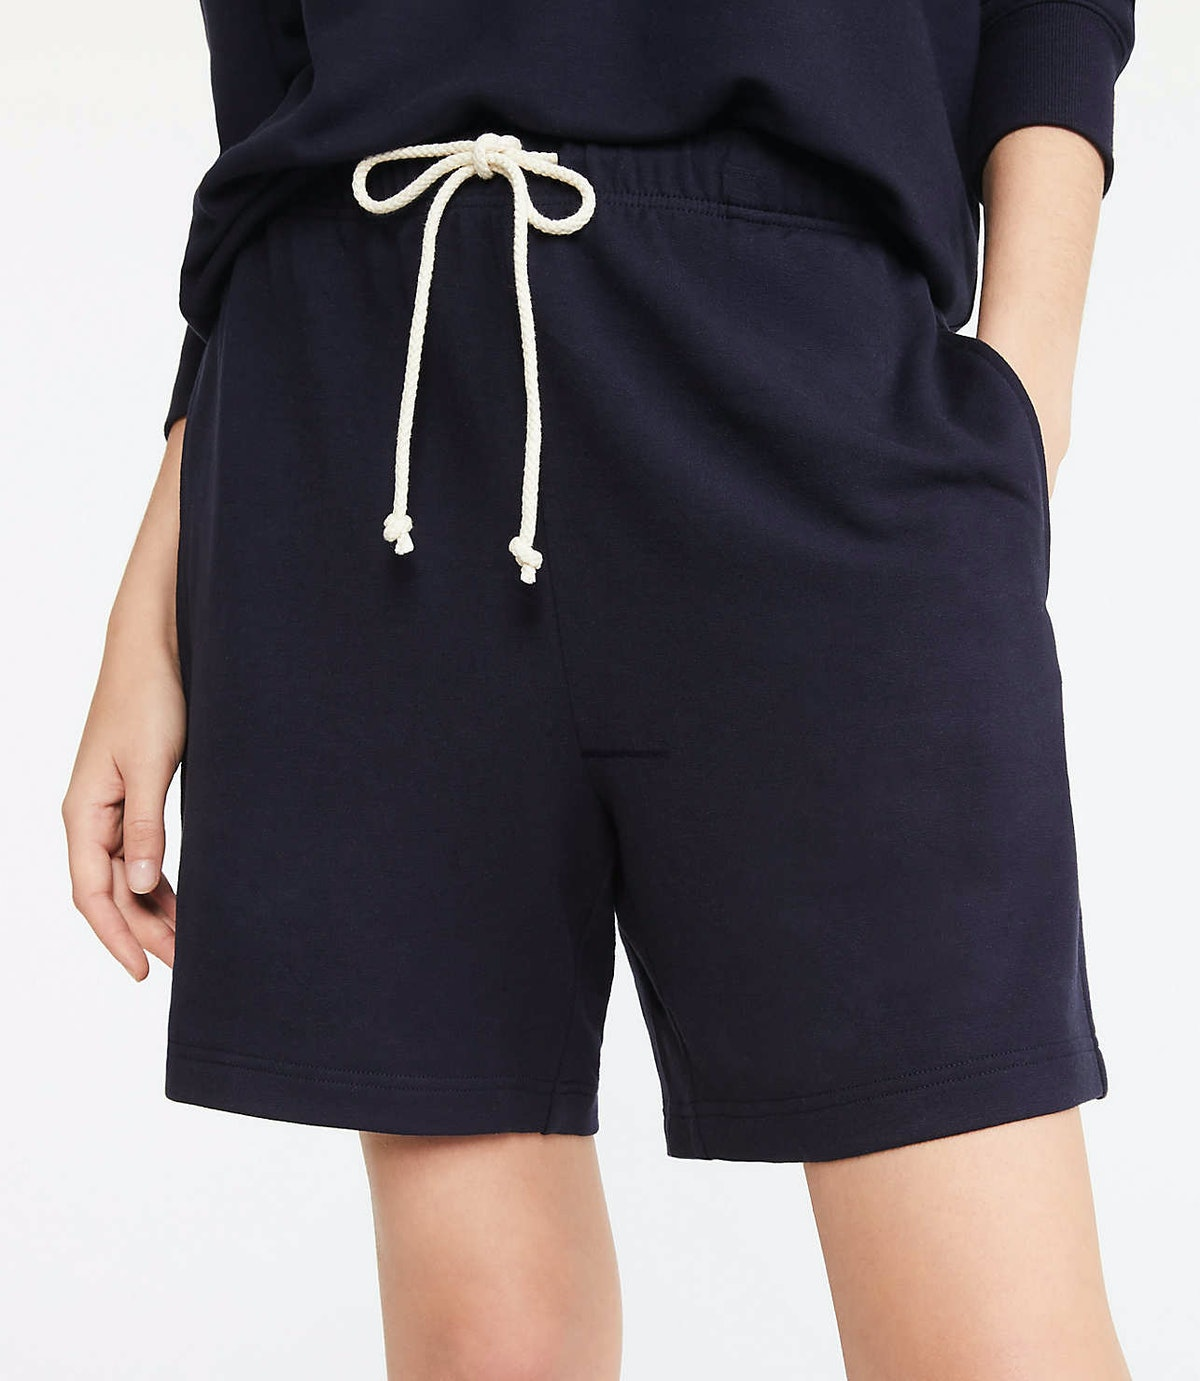 Signaturesoft Super Plush Shorts